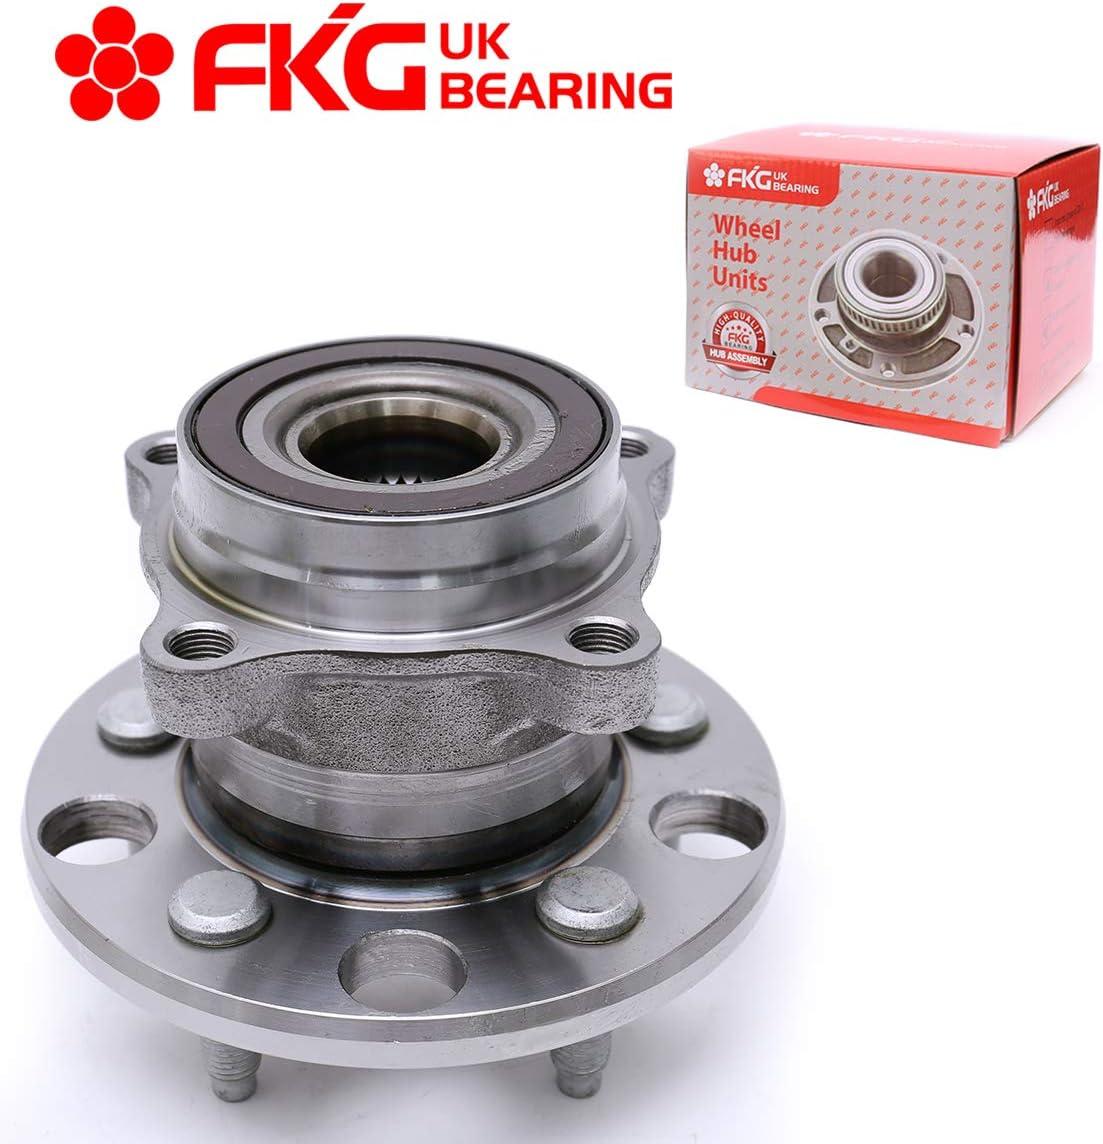 FKG 512337 Rear Wheel Bearing Hub Assembly fit for 06-13 Lexus IS350 IS250 08-11 Lexus GS460 07-11 Lexus GS350 06-07 Lexus GS430 5 Lugs 08-13 Lexus IS F